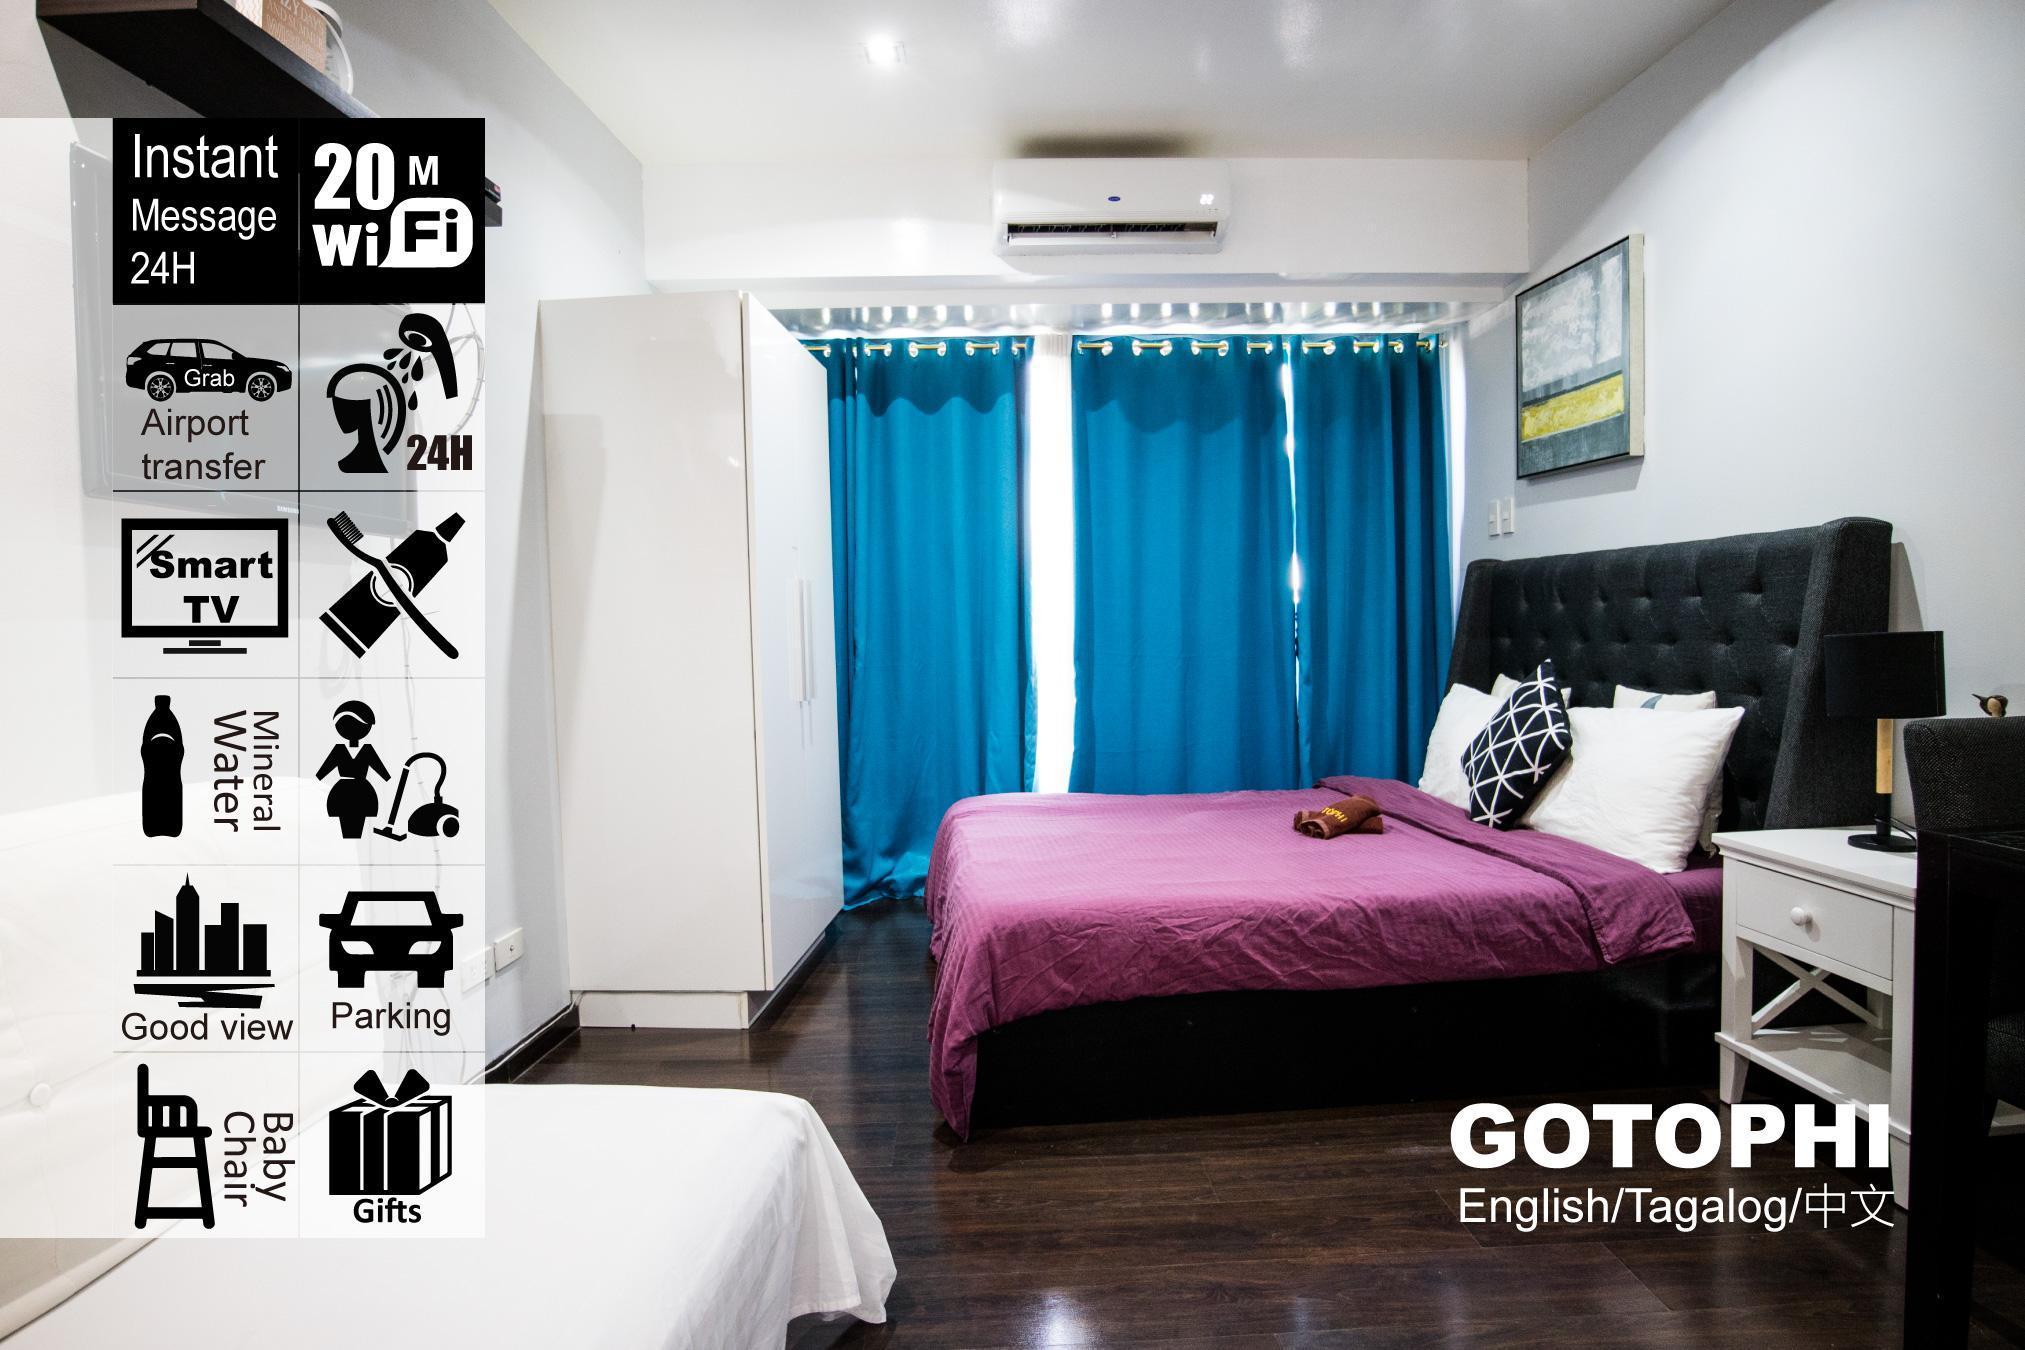 Gotophi Luxurious Hotel Knightsbridge Makati 5008